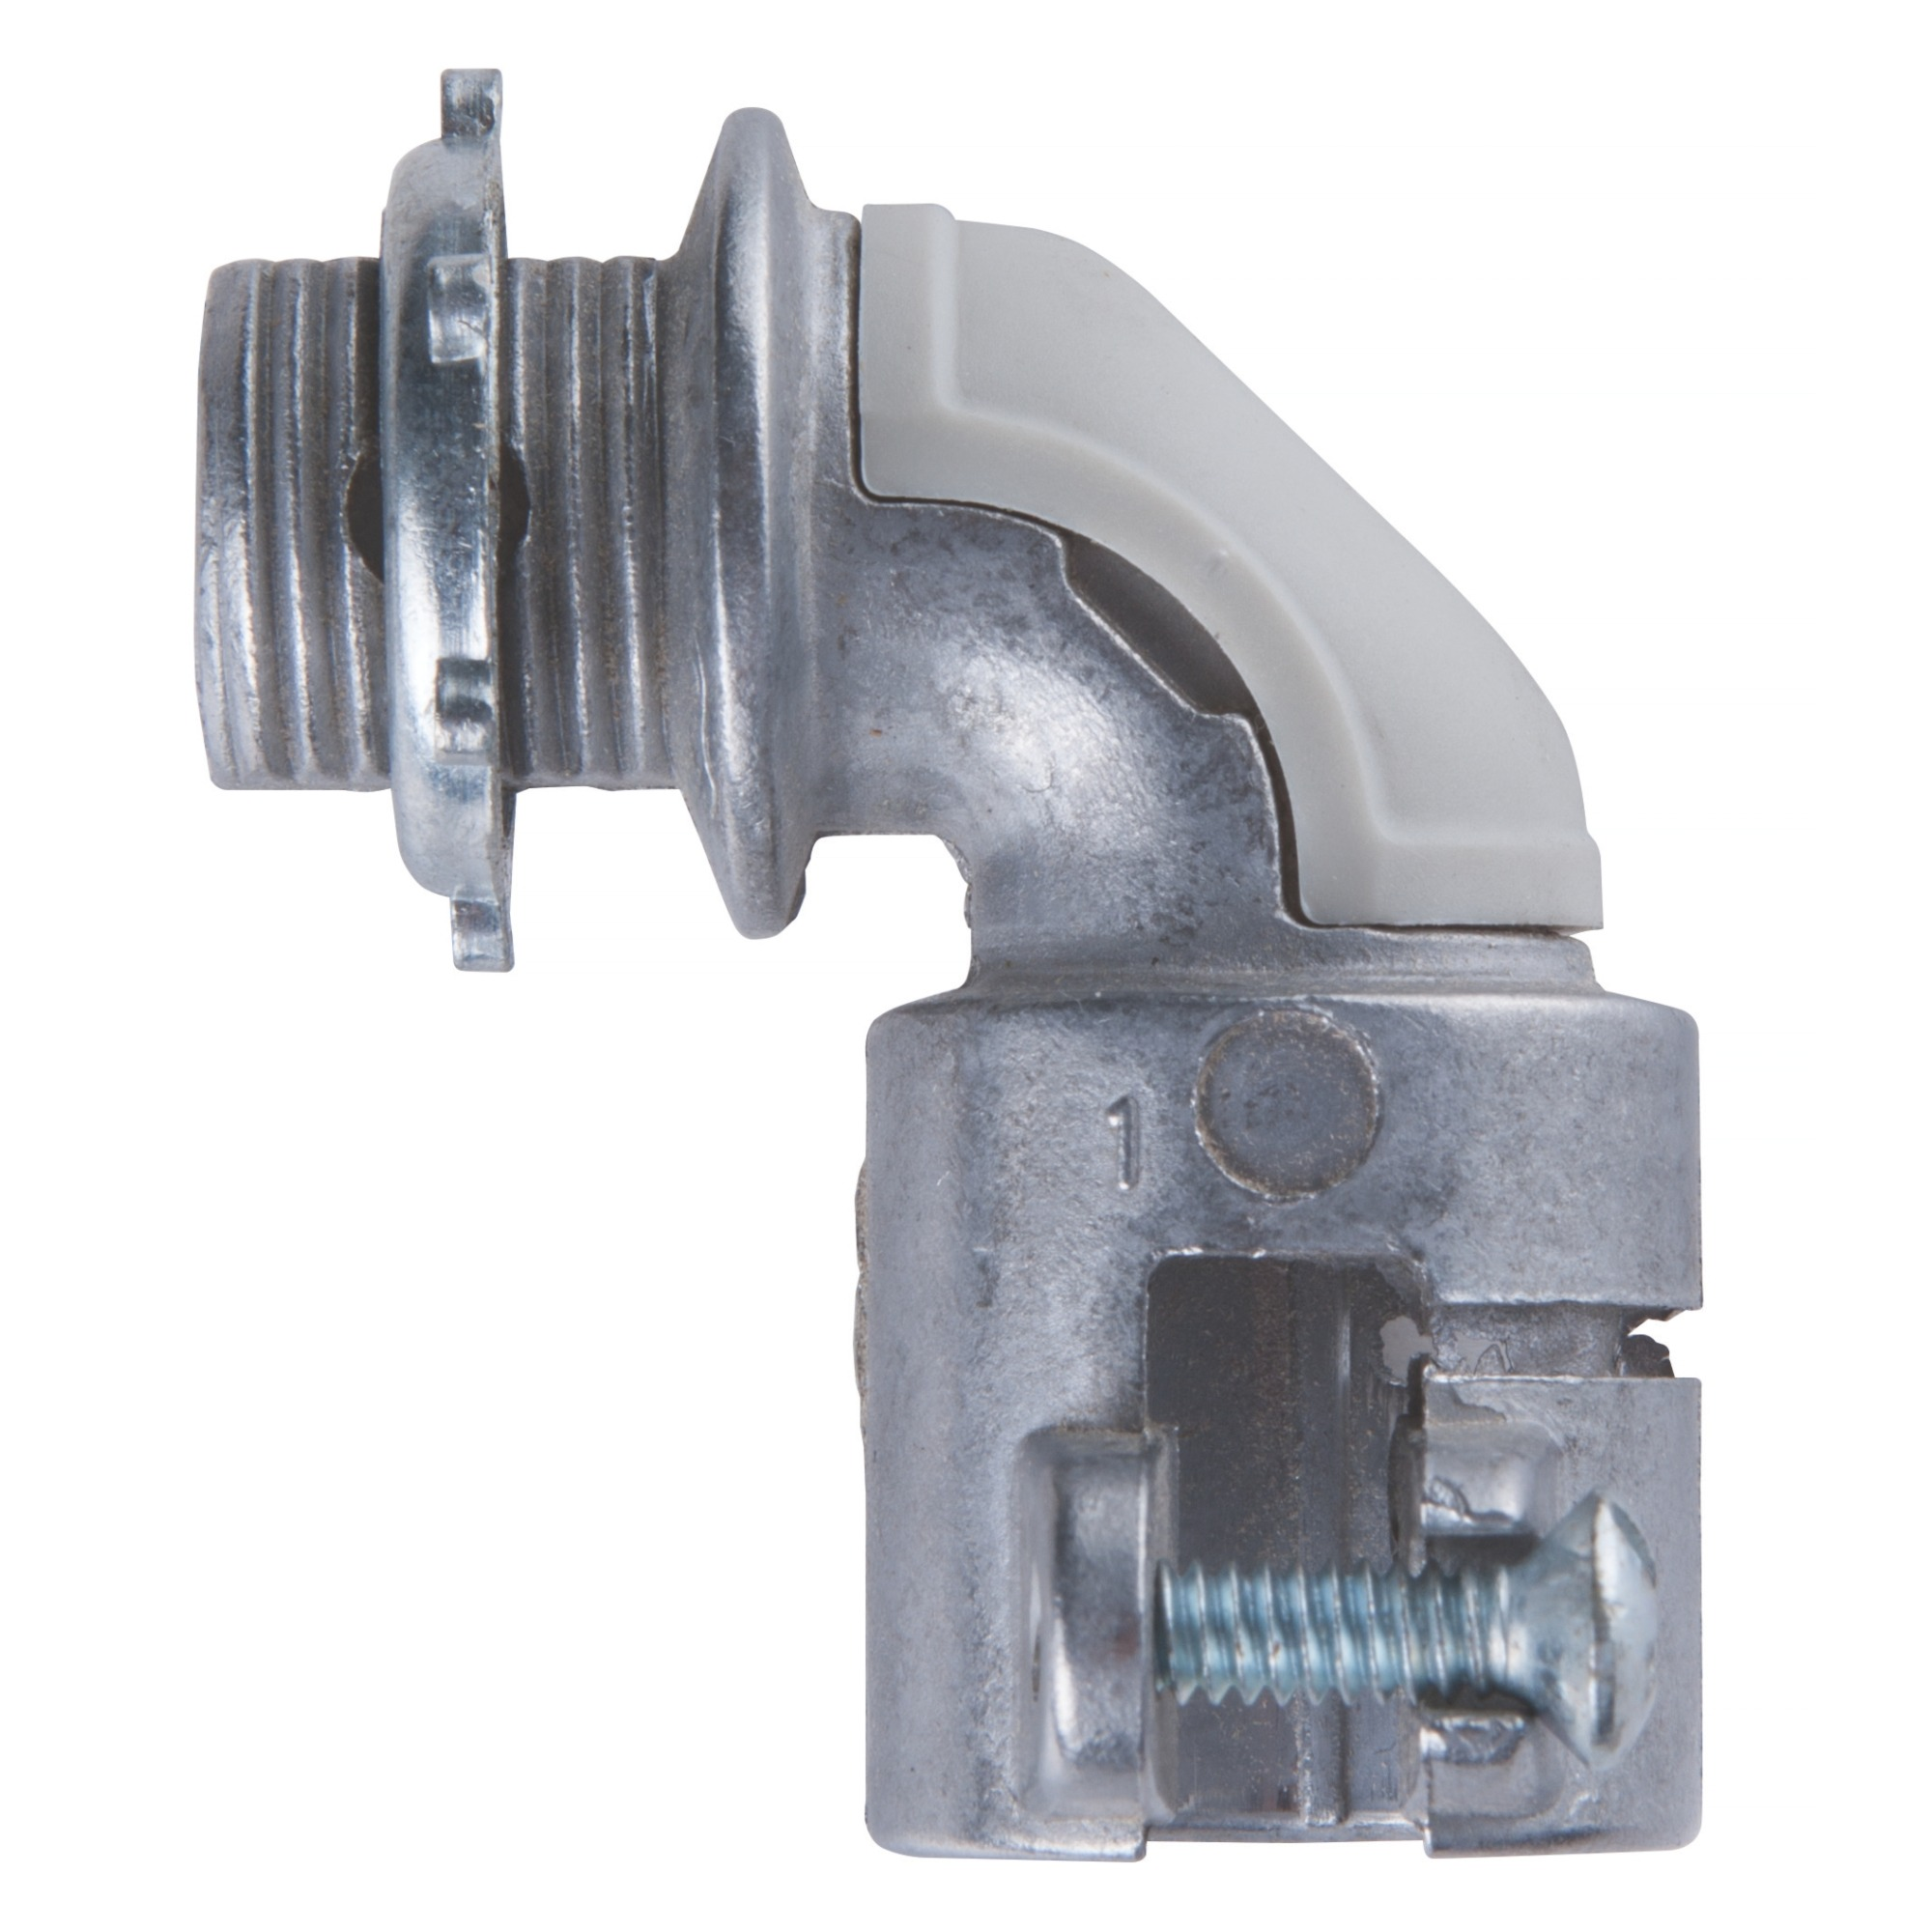 Box Curvo de Aluminio com Rosca 12 - 56128001 - Tramontina